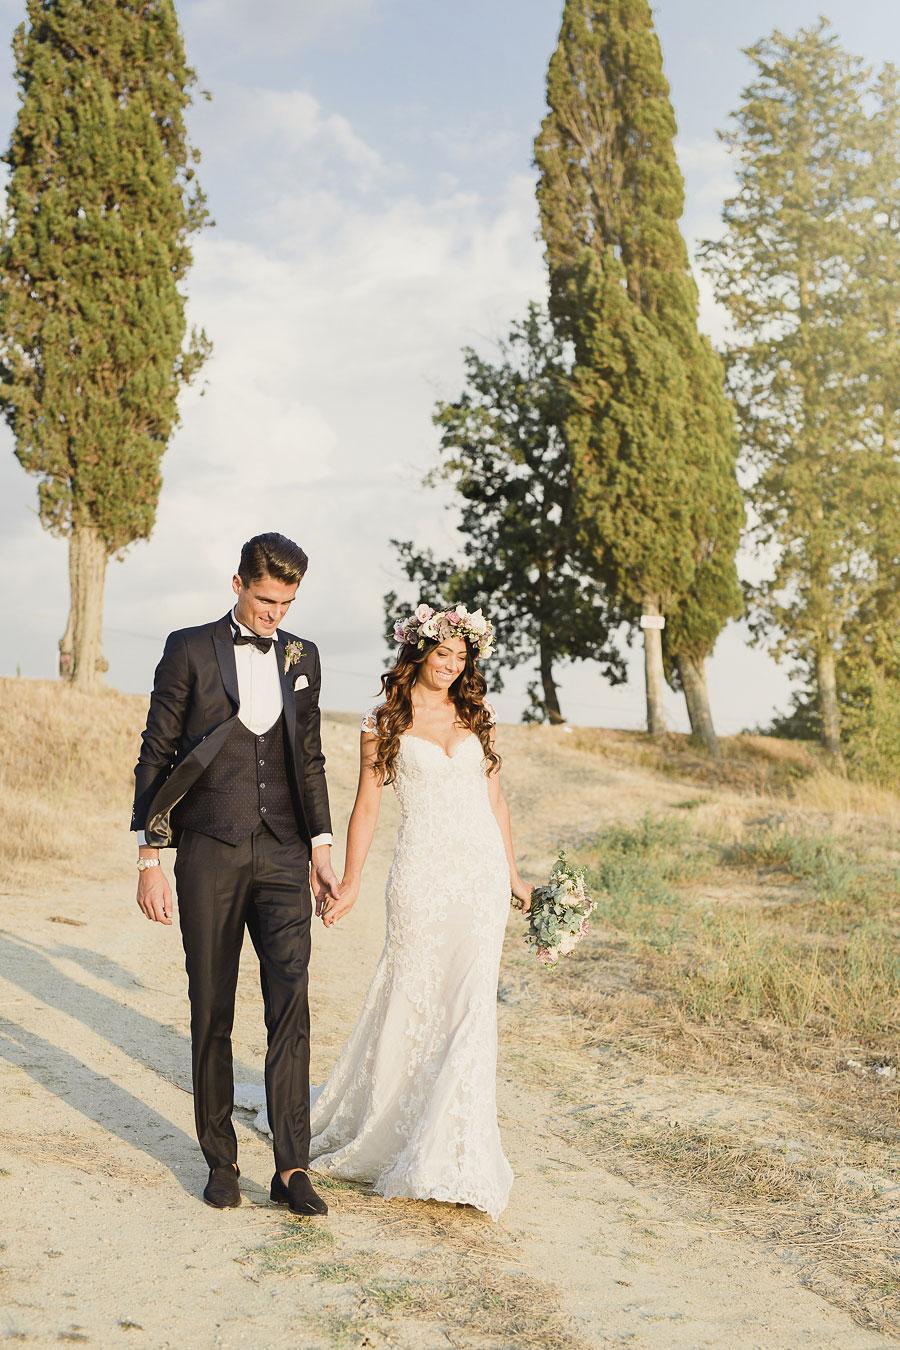 Wedding-Nicholad-and-Federica-Giuseppe-Giovannelli-216